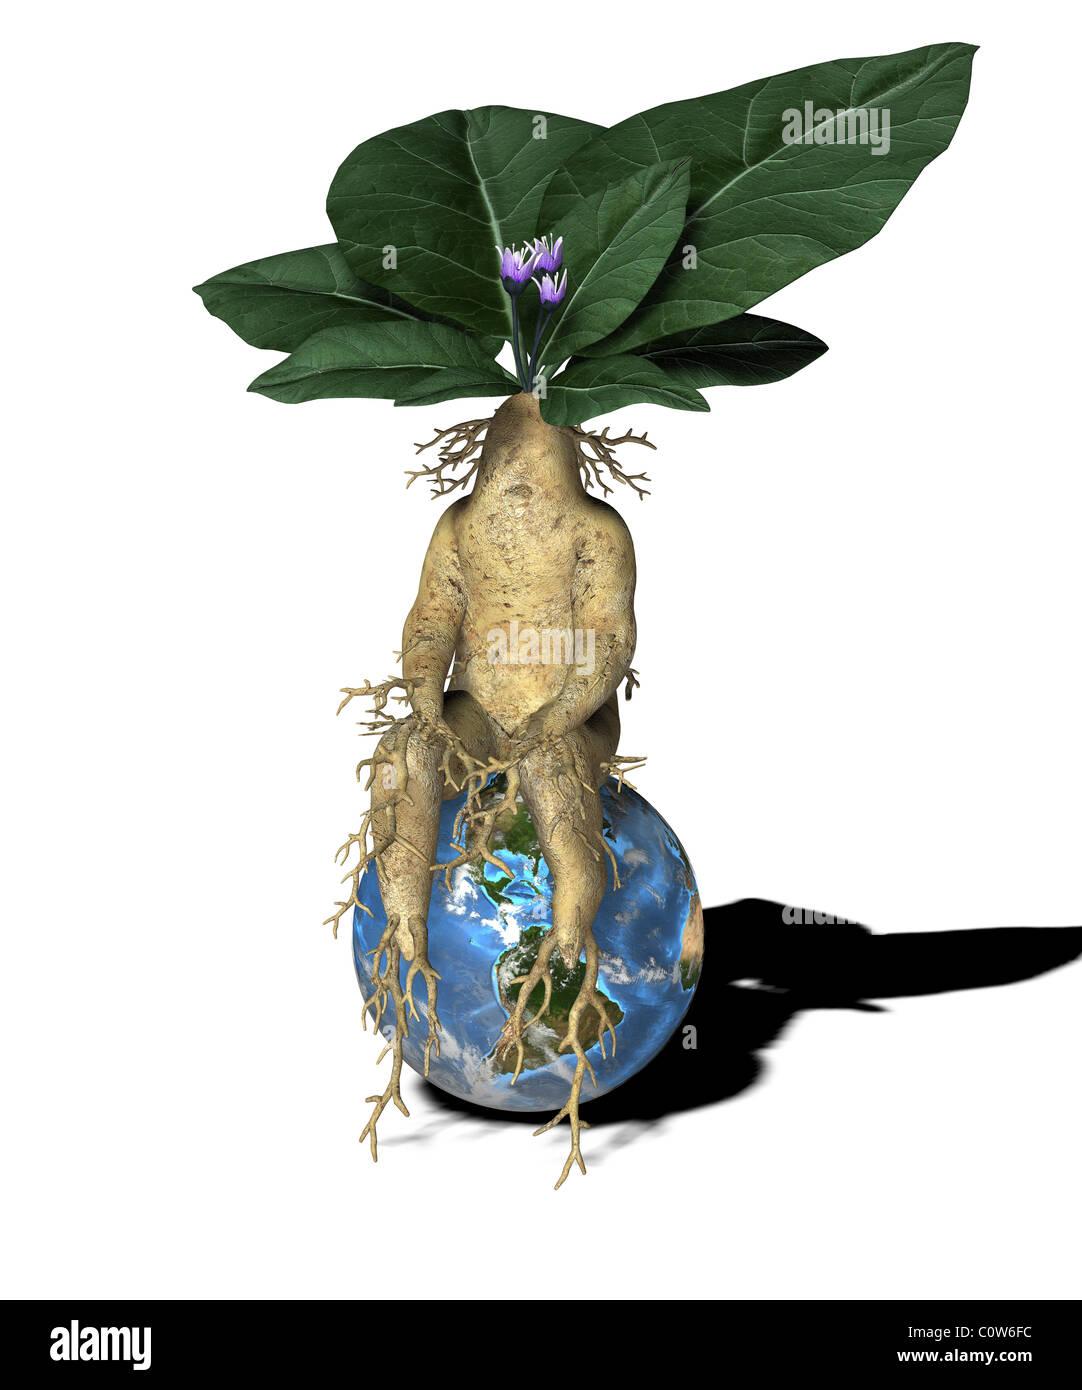 Pflanze-Figur mit Kugel Stockbild